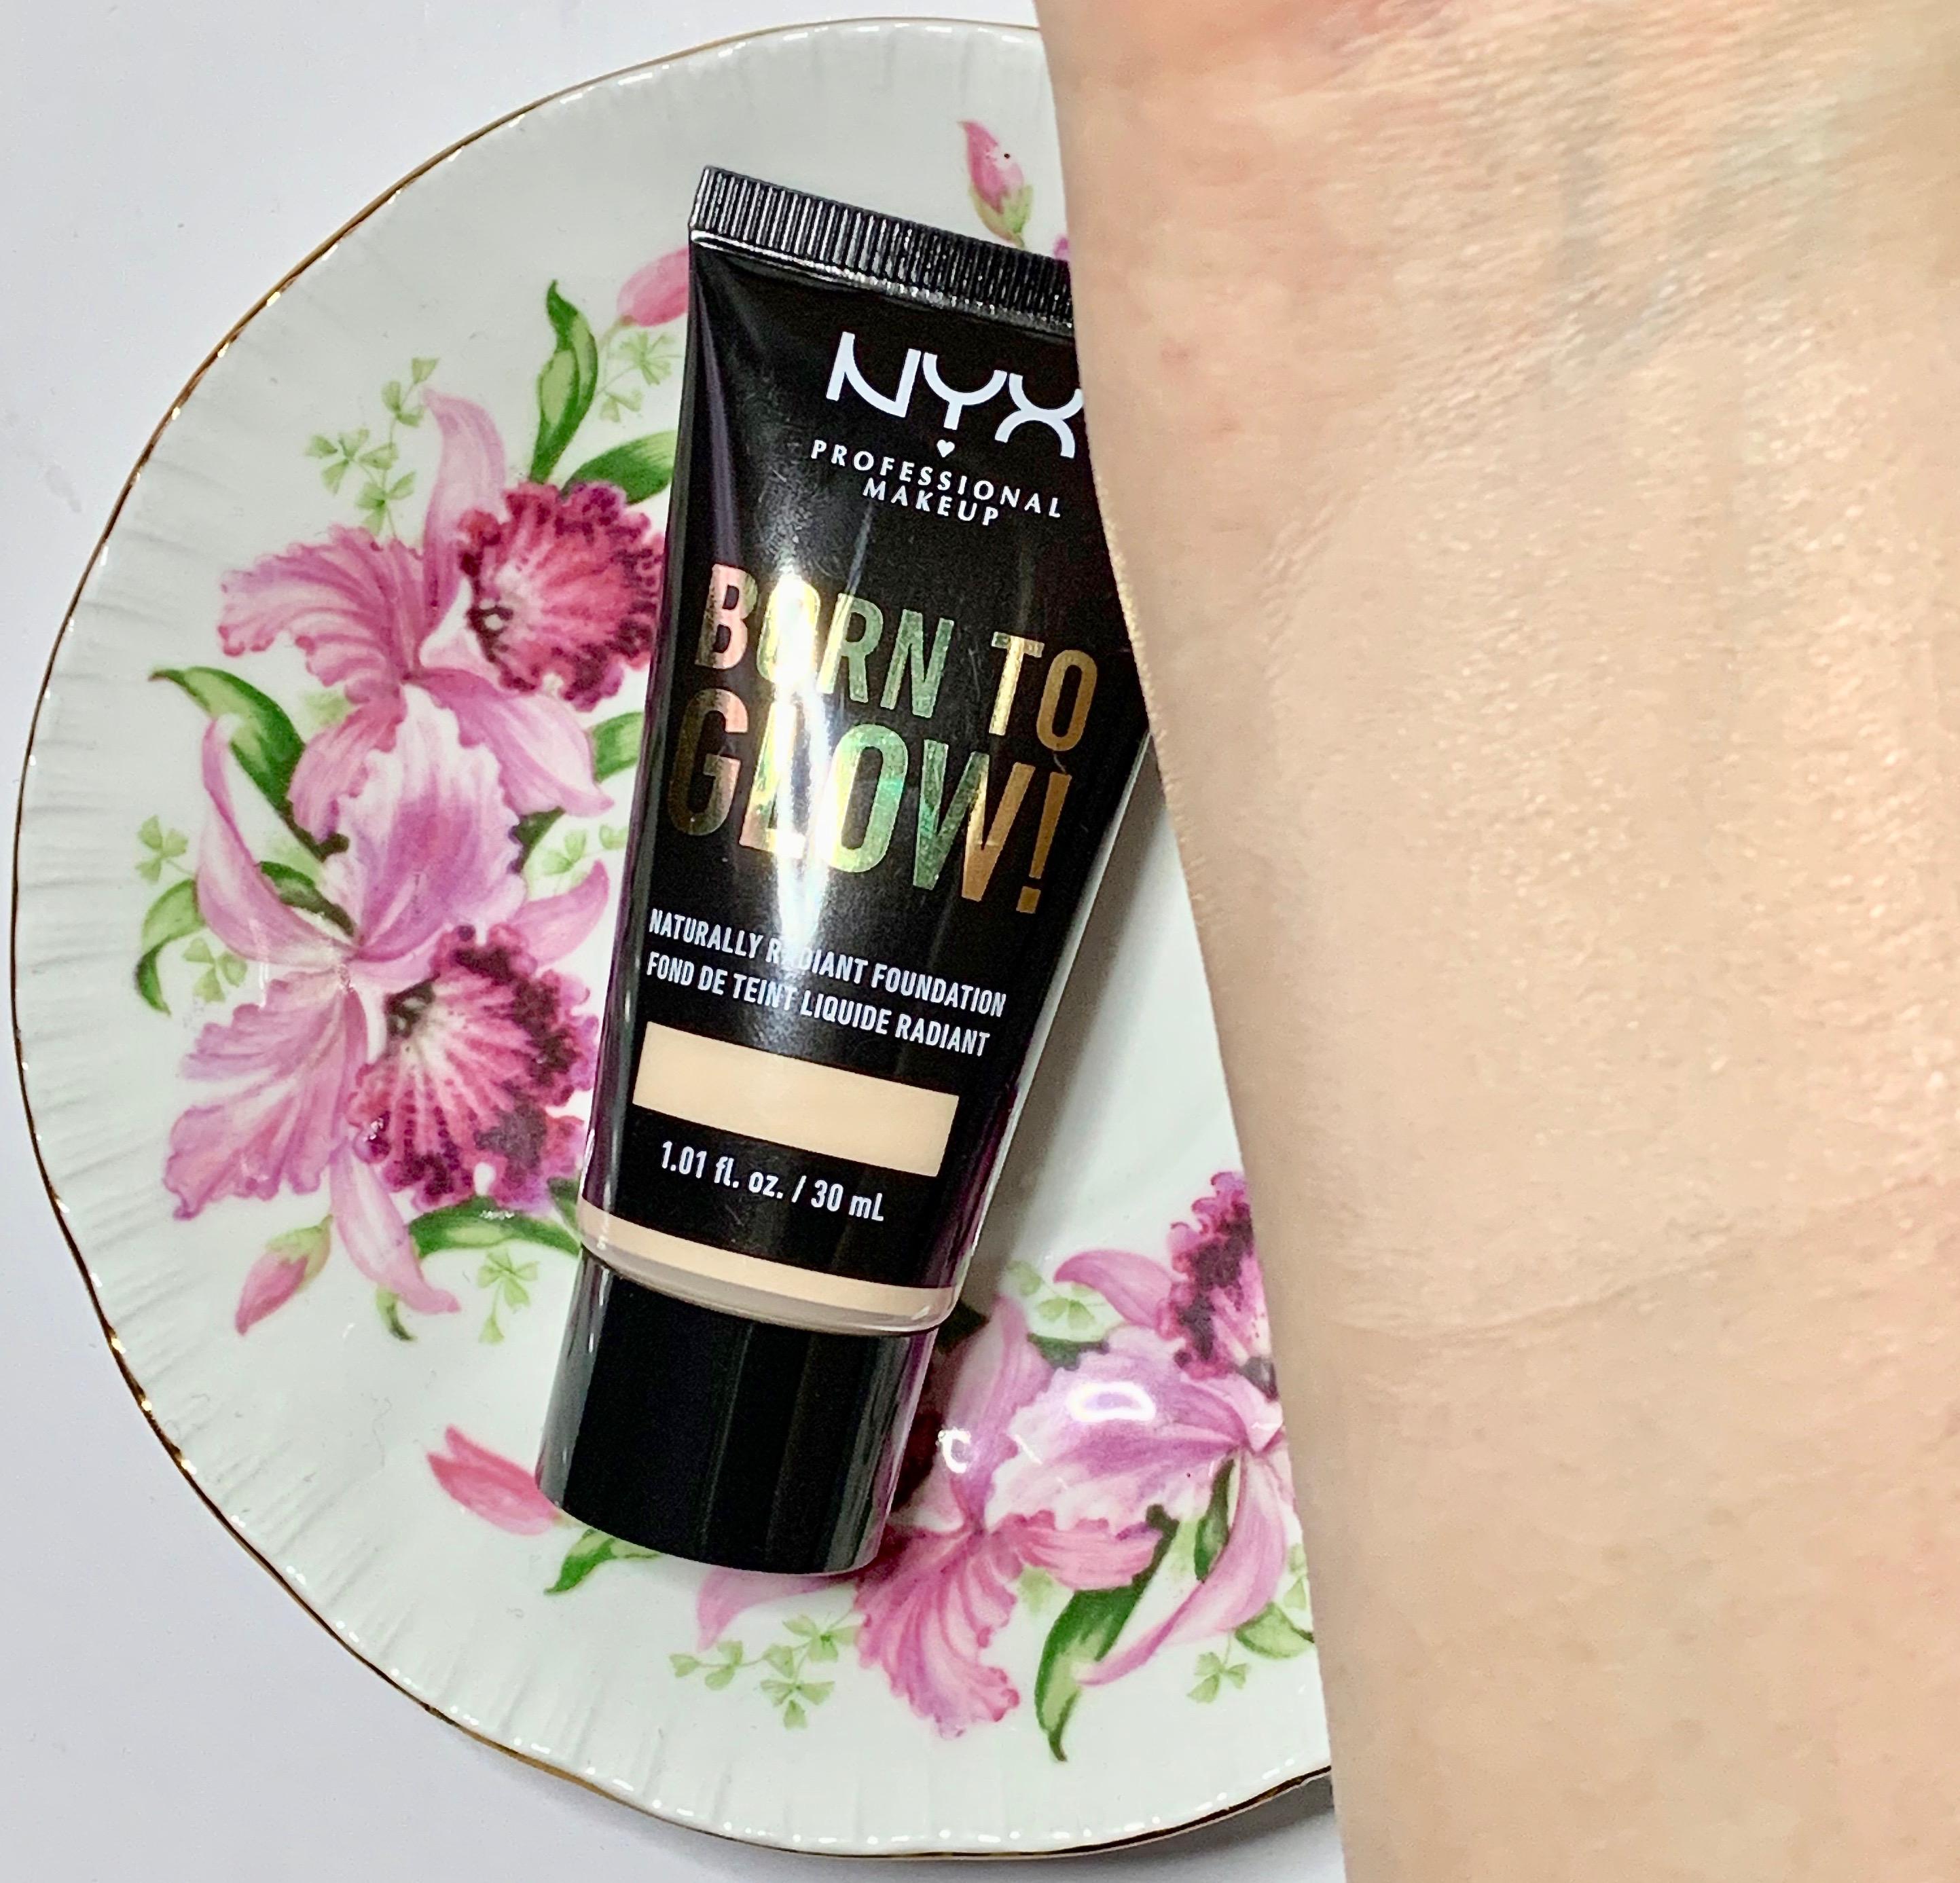 Nyx Born to Glow Naturally Radiant Foundation